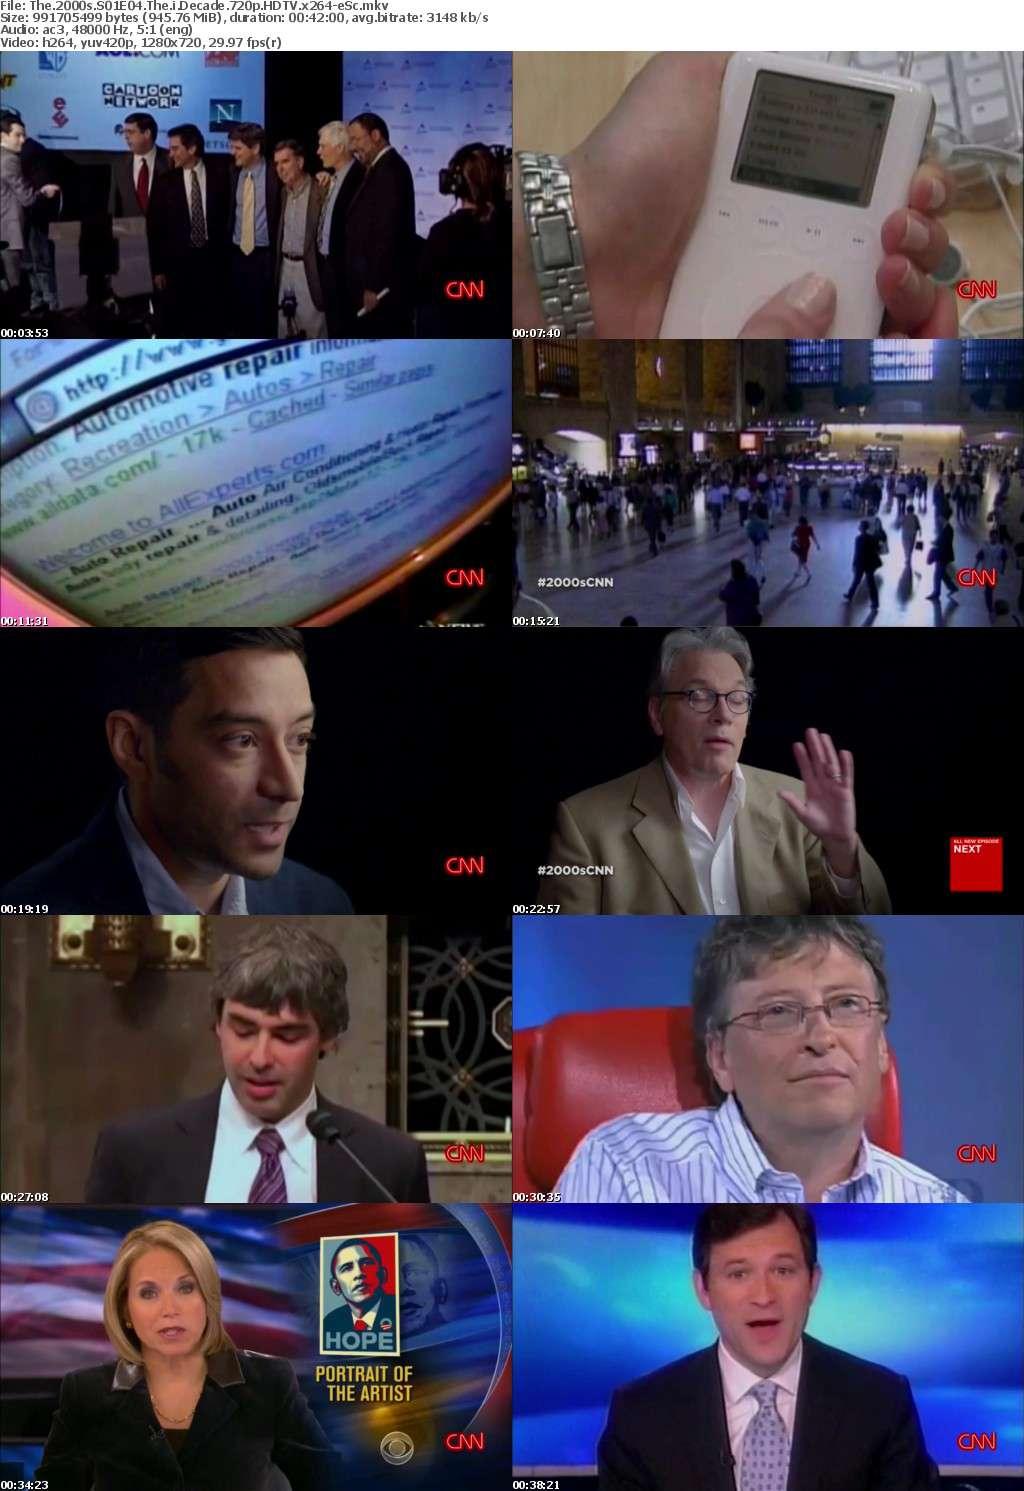 The 2000s S01E04 The i Decade 720p HDTV x264-eSc